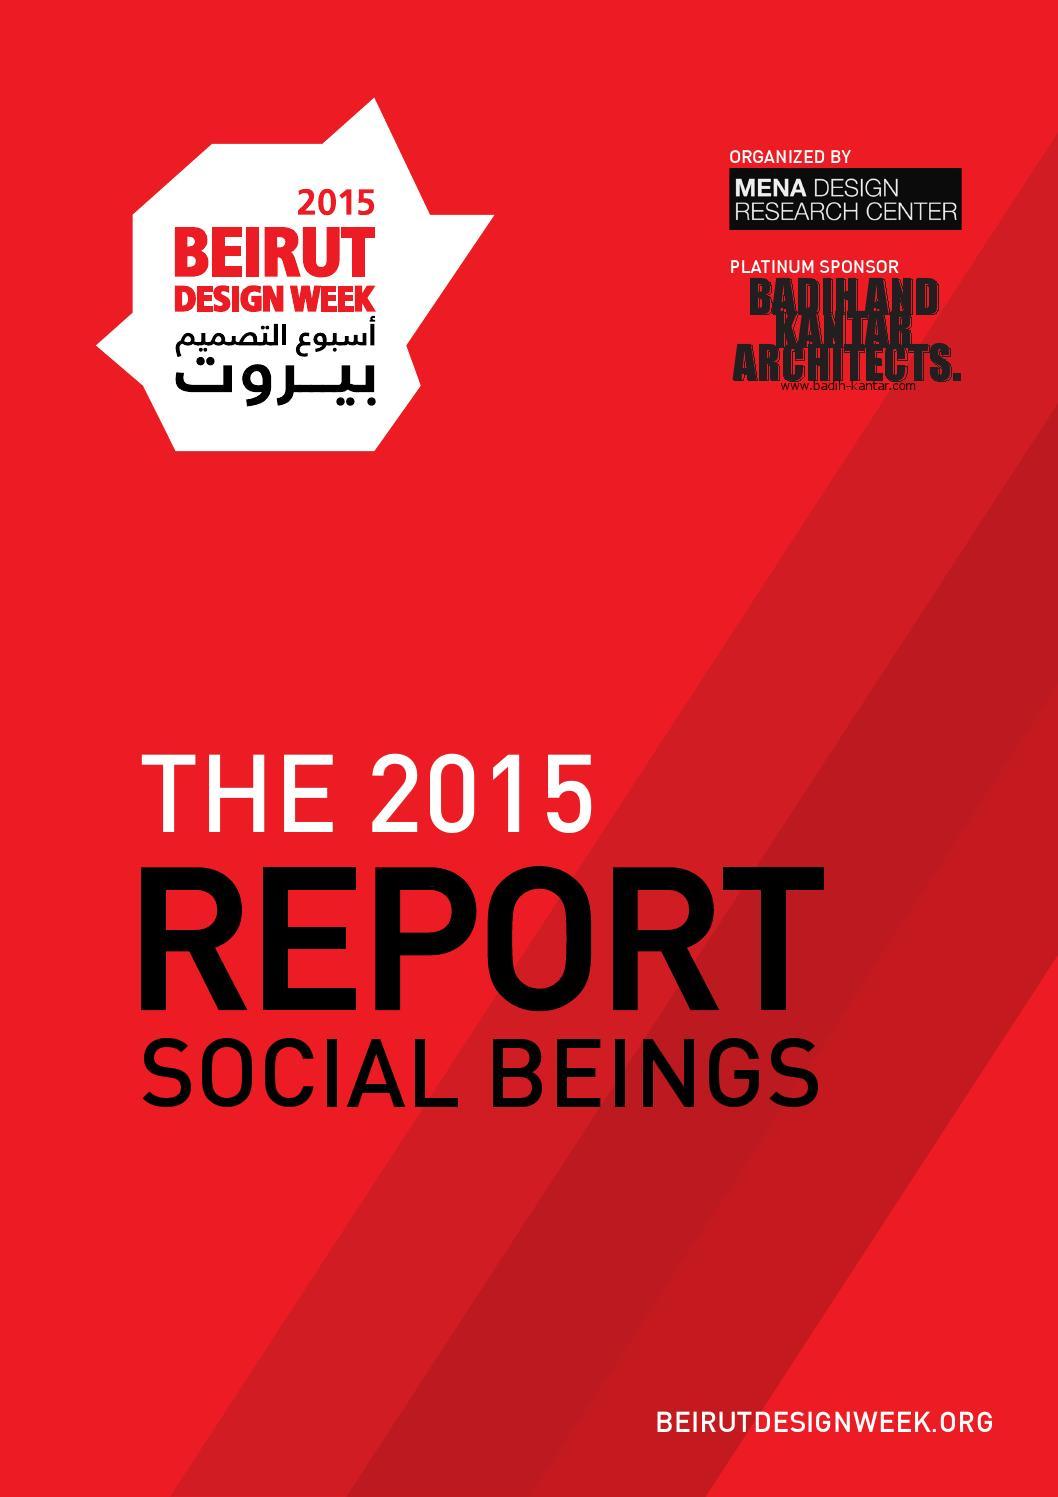 Beirut Design Week 2015 Report By Mena Design Research Center Issuu